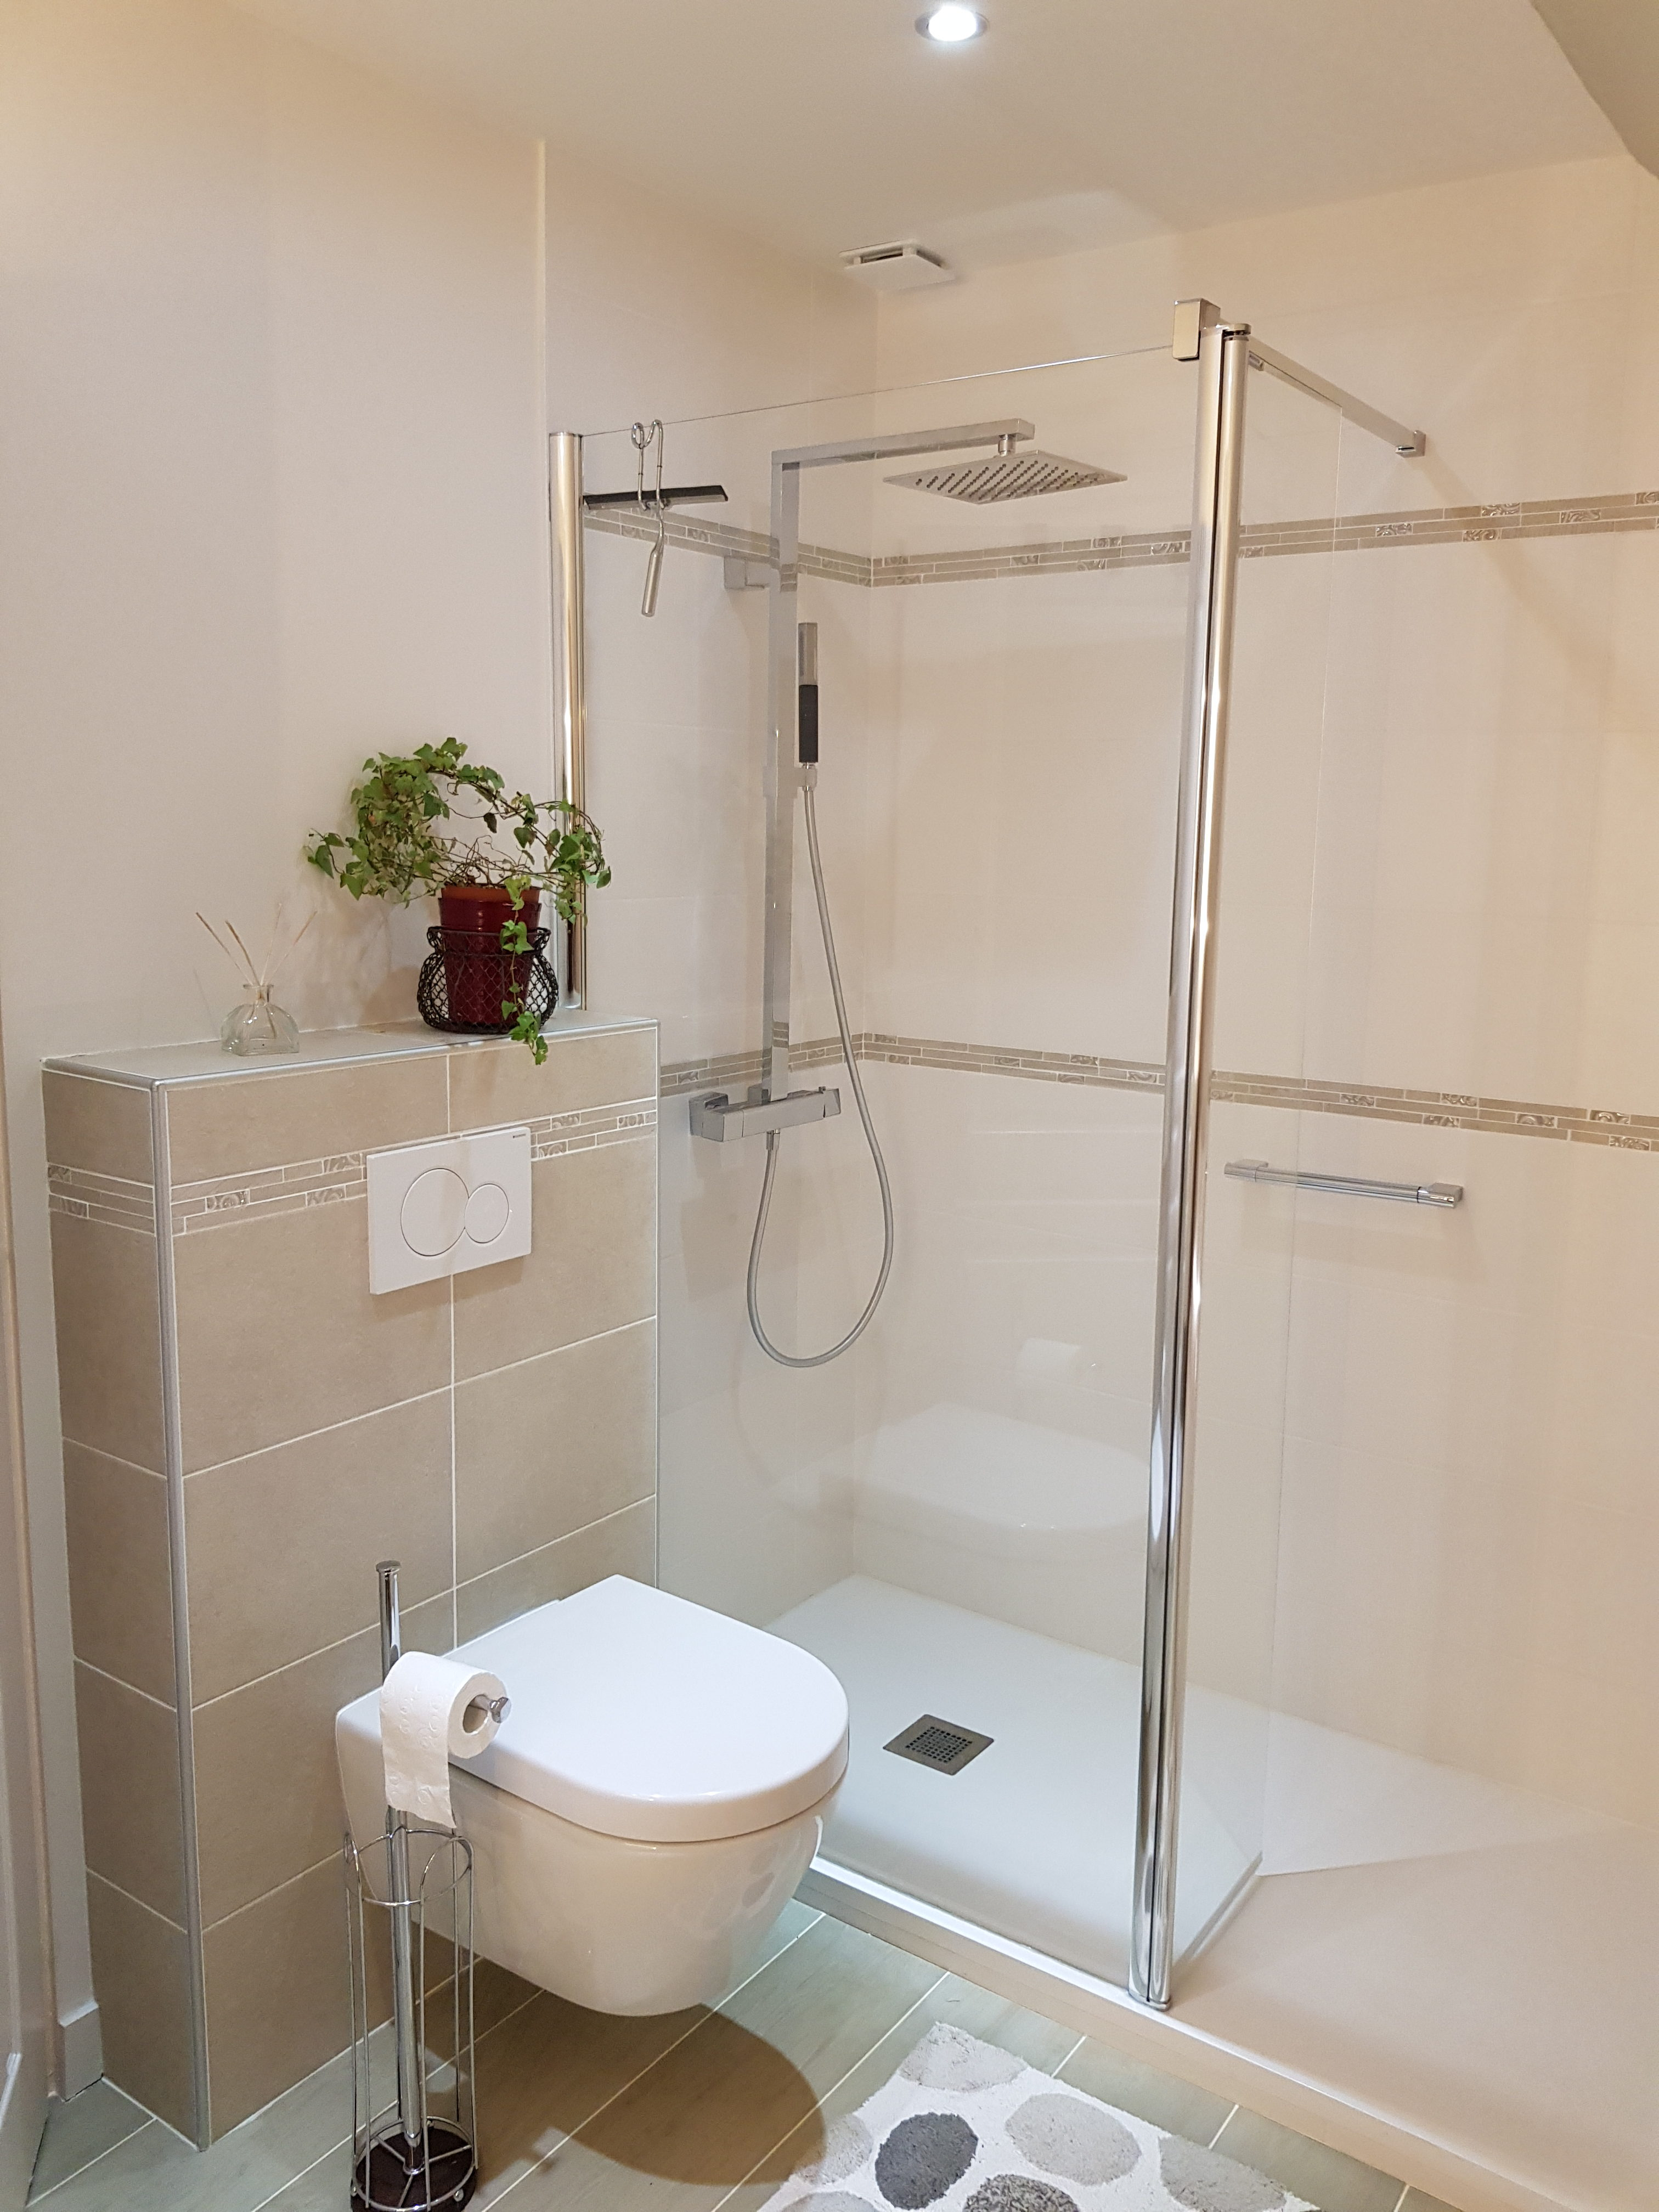 Moderniser Salle De Bain salle de bain - atelier & création